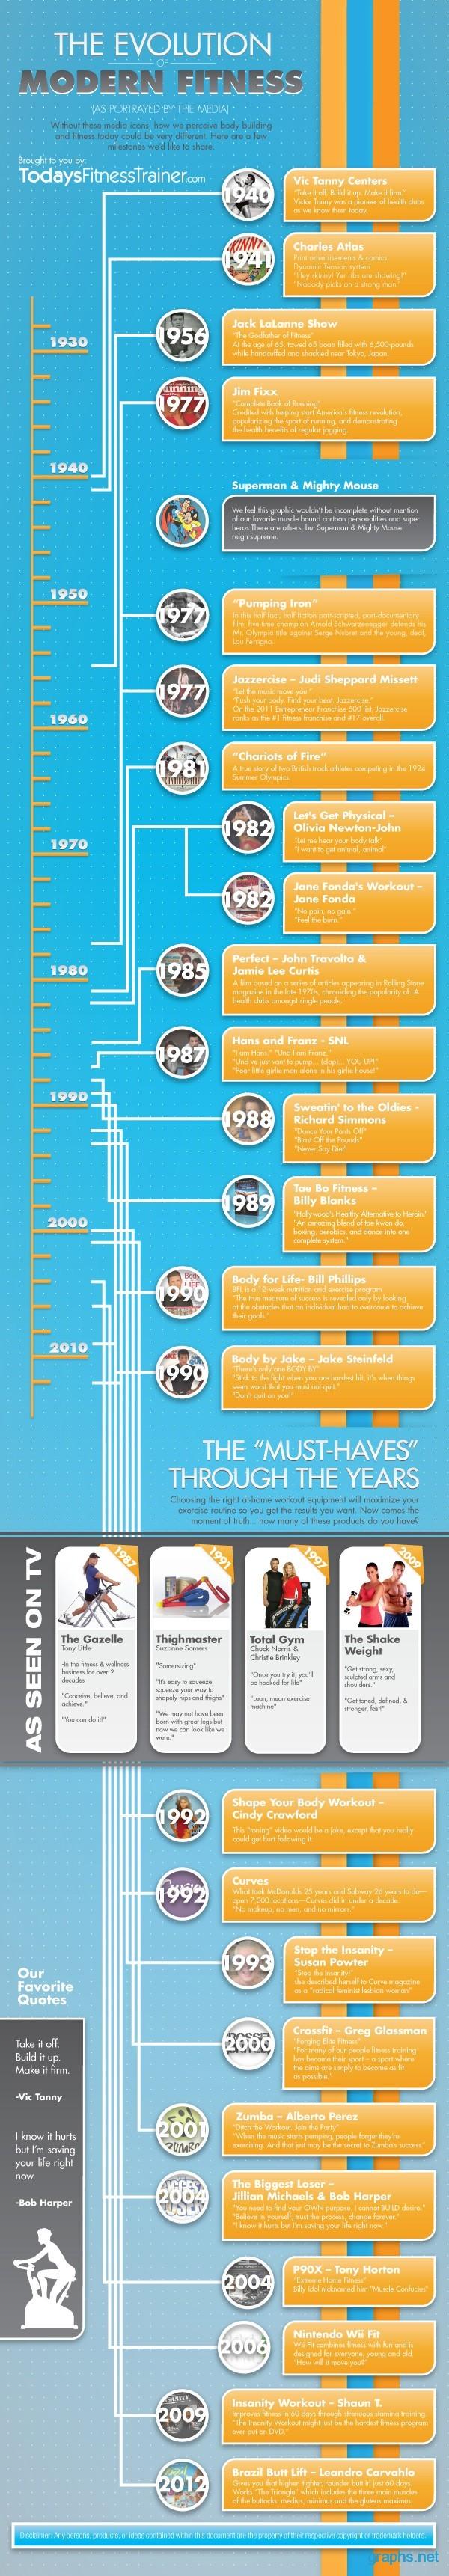 Fitness History Timeline Chart